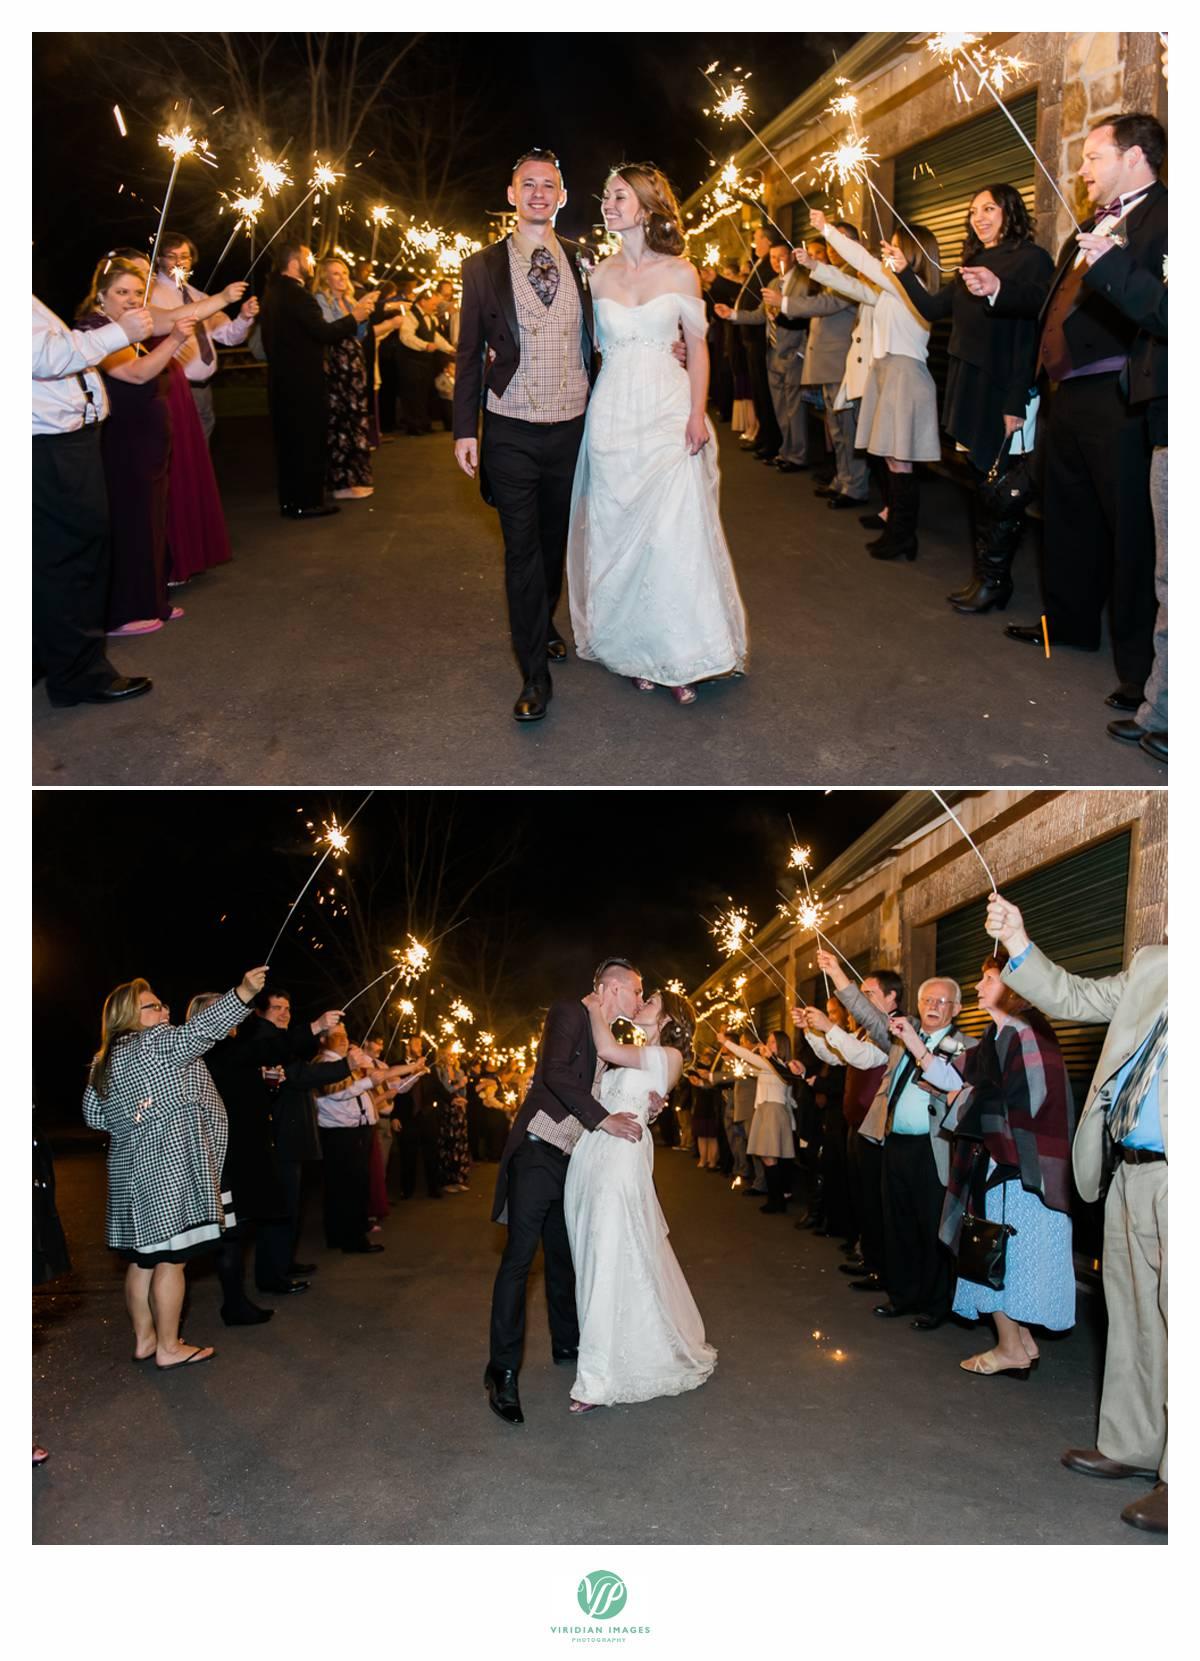 Retreat-at-Hiawassee-river-wedding-Viridian-Images-Photography 32